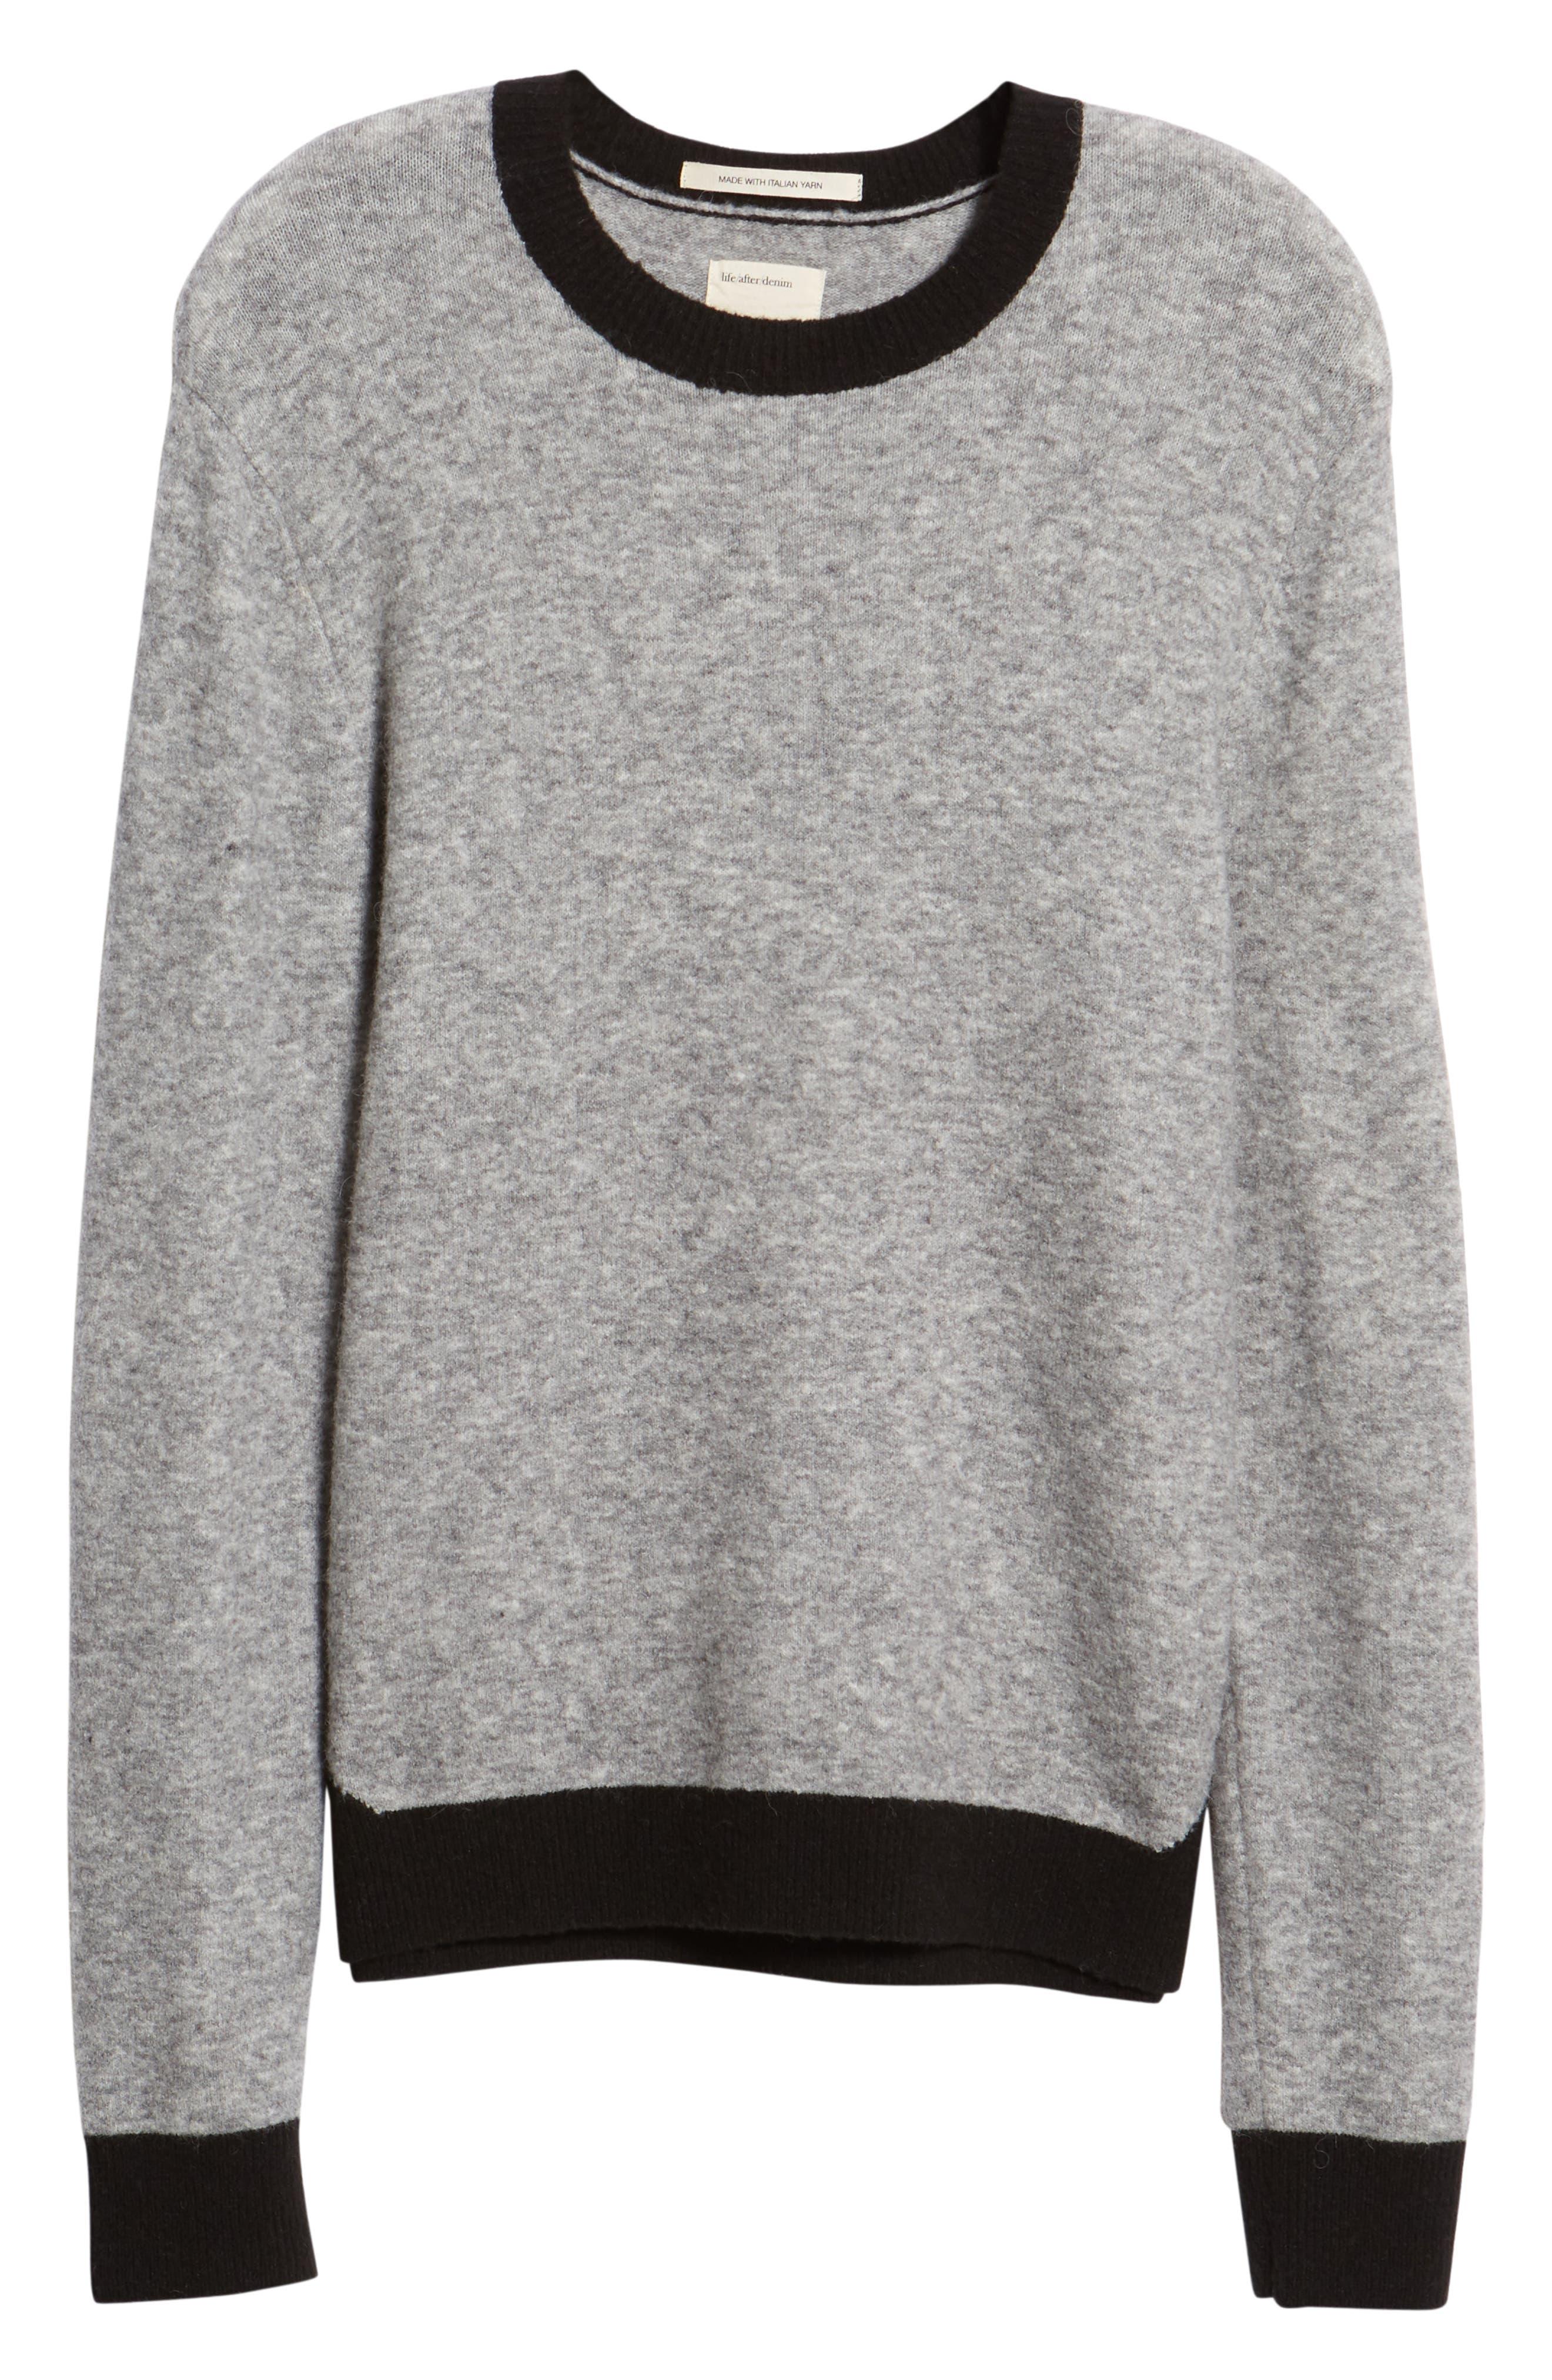 Clermont Slim Fit Crewneck Sweater,                             Alternate thumbnail 6, color,                             LIGHT HEATHER GREY